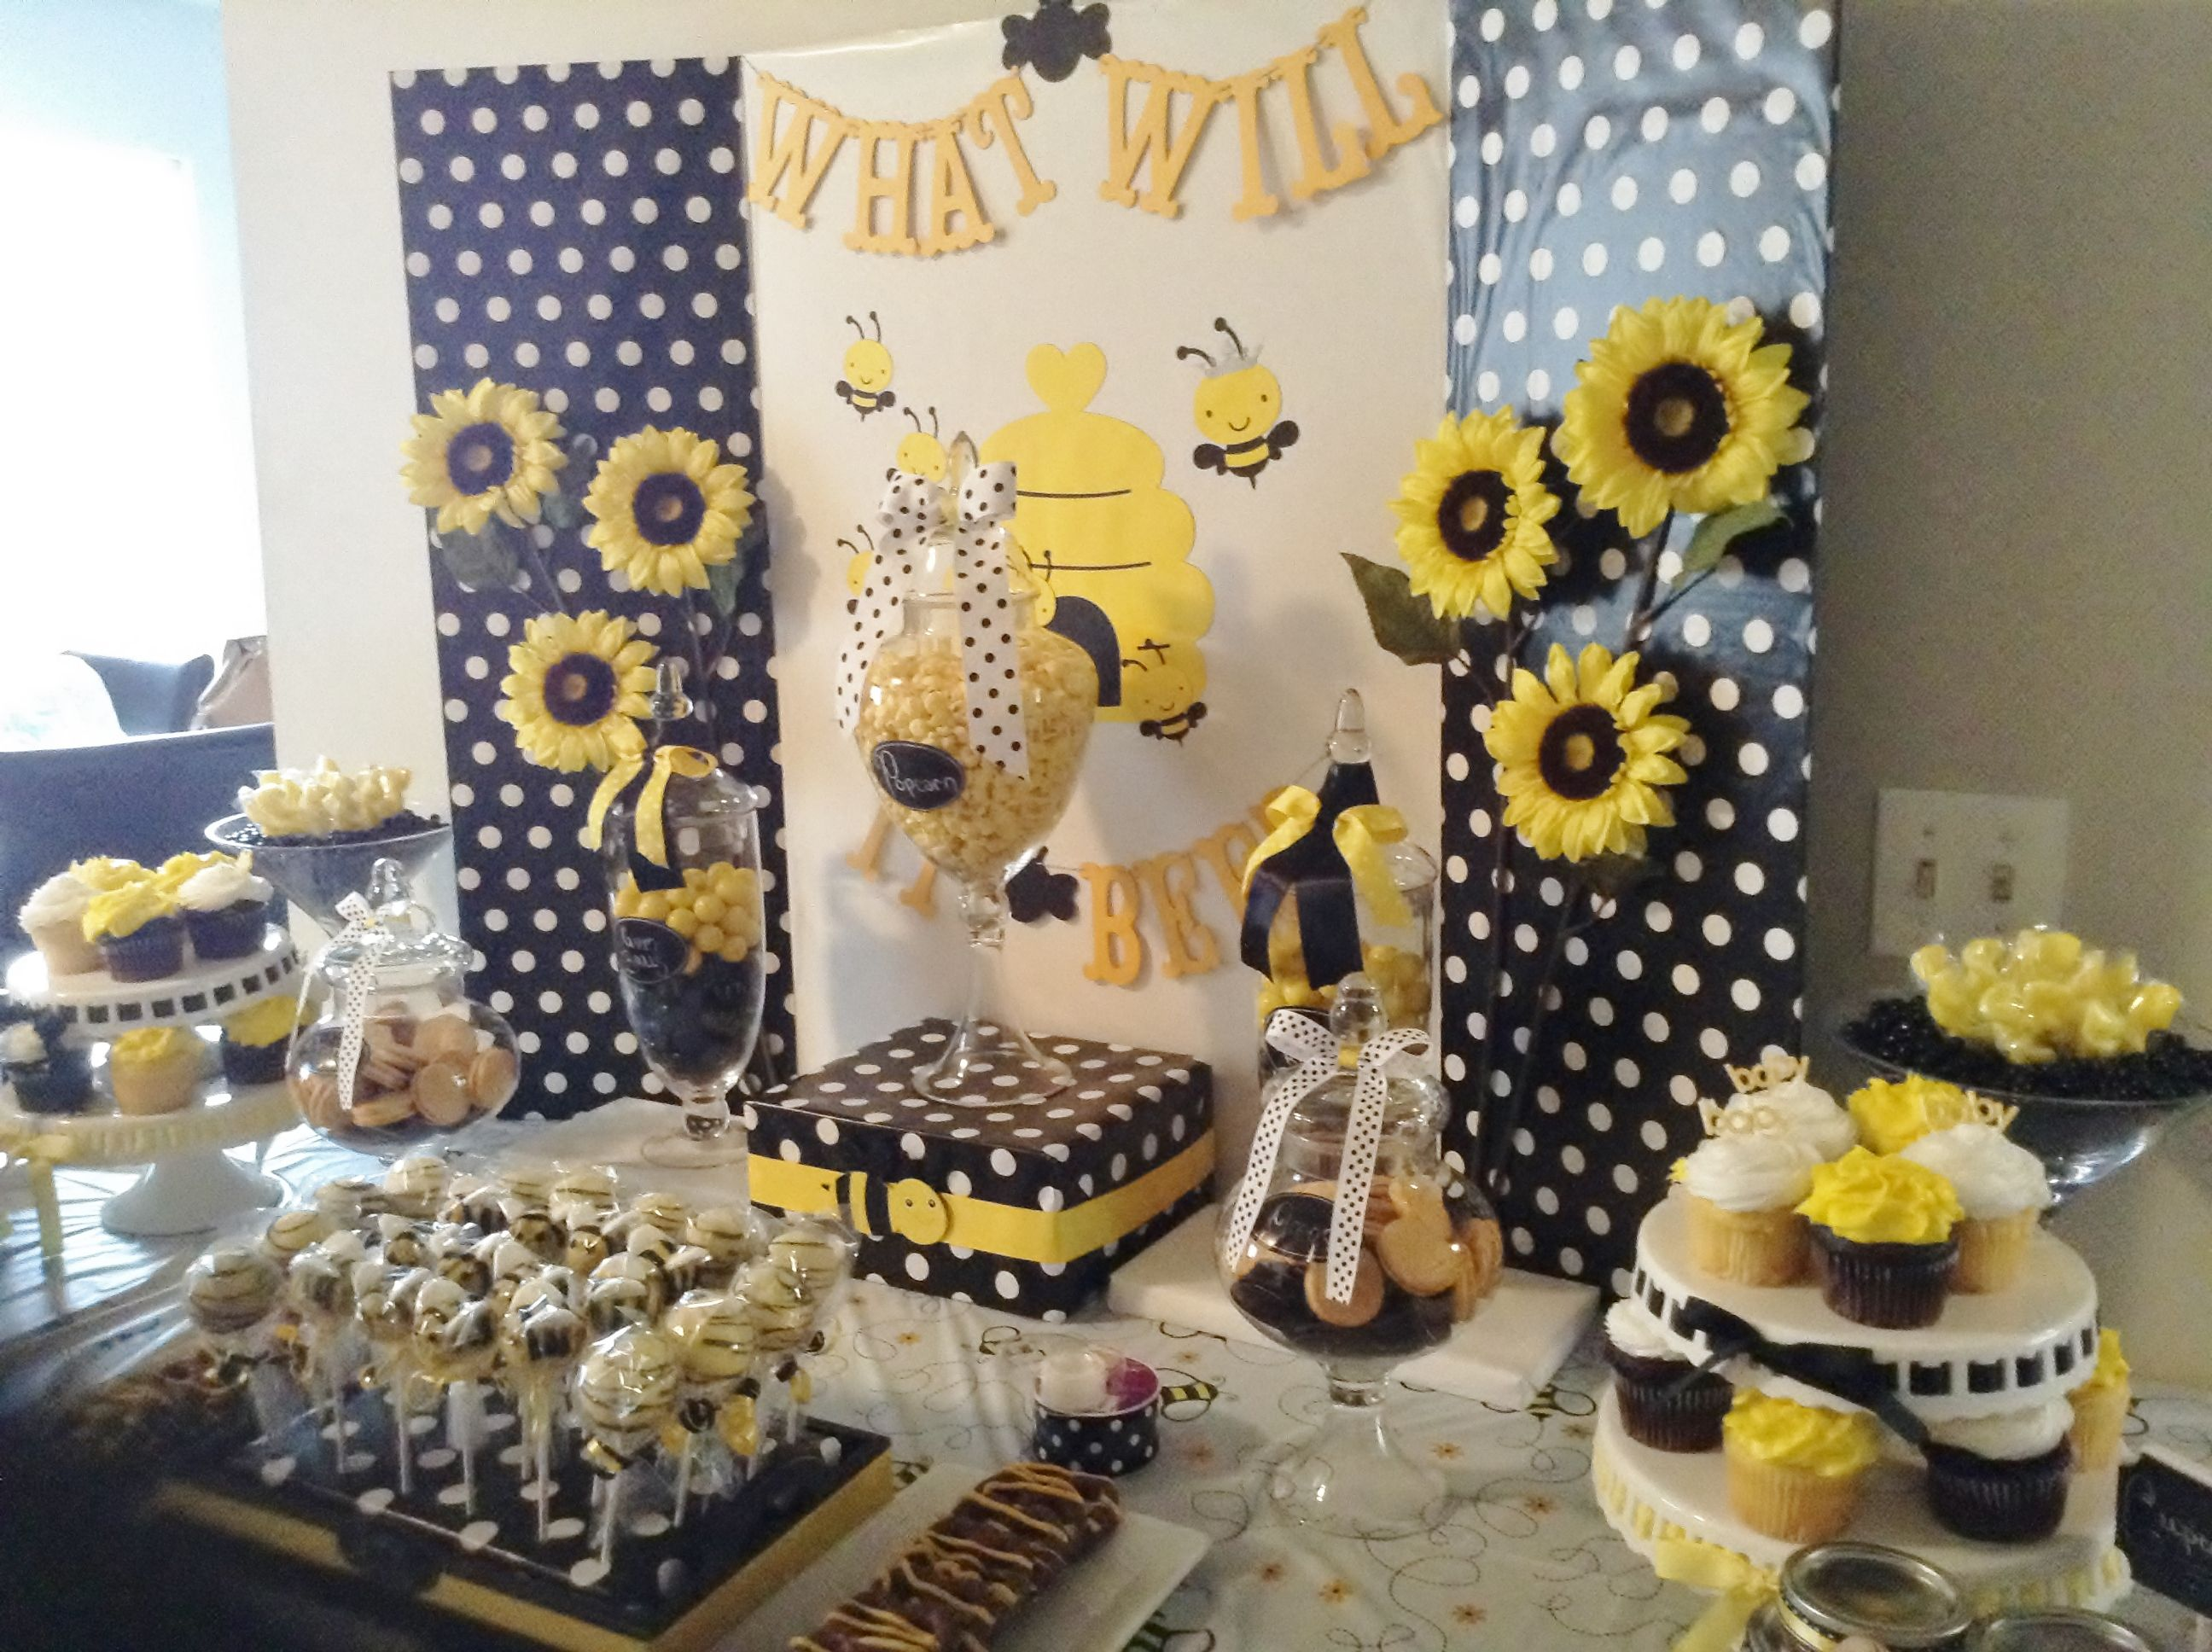 What Will It Bee, Gender Reveal, Bee Party, Bumble Bee Party. Bee  DecorationsBee Gender RevealBee Baby ShowersGender ...